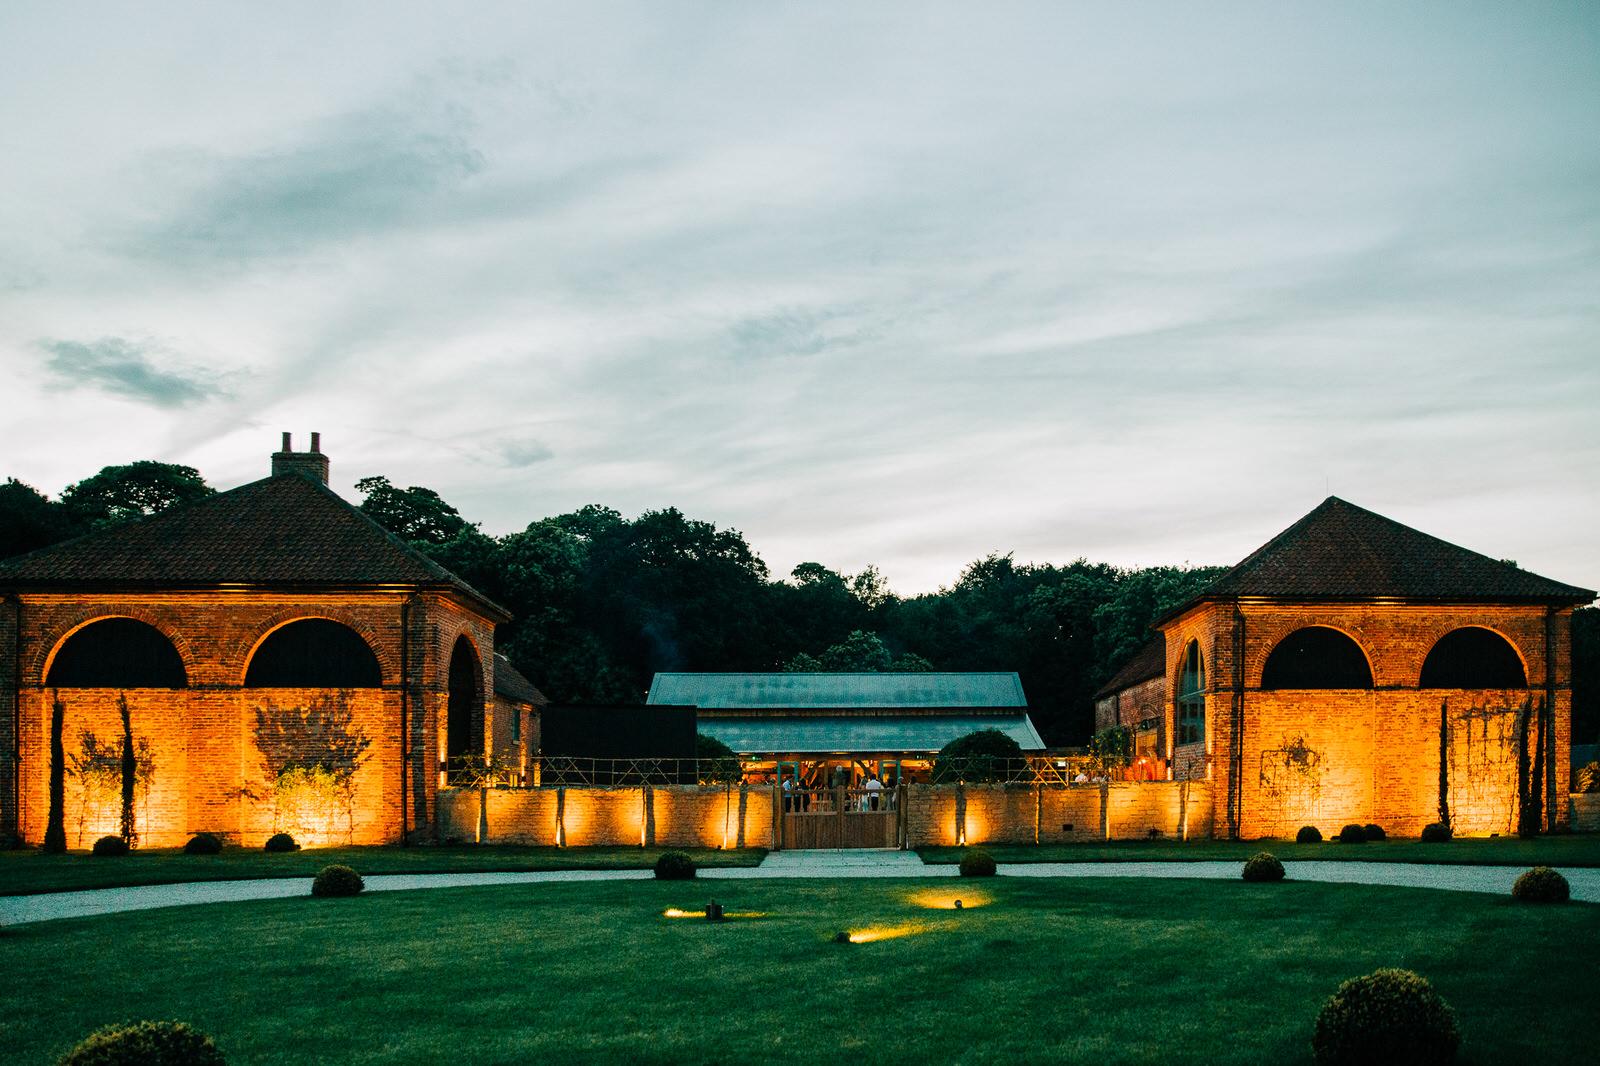 Hazel Gap Barn -Claire Robinson photography - Yasmin & Sandy - 8.7.17-296hazel+gap+nottinghamshire+wedding+venue.jpg